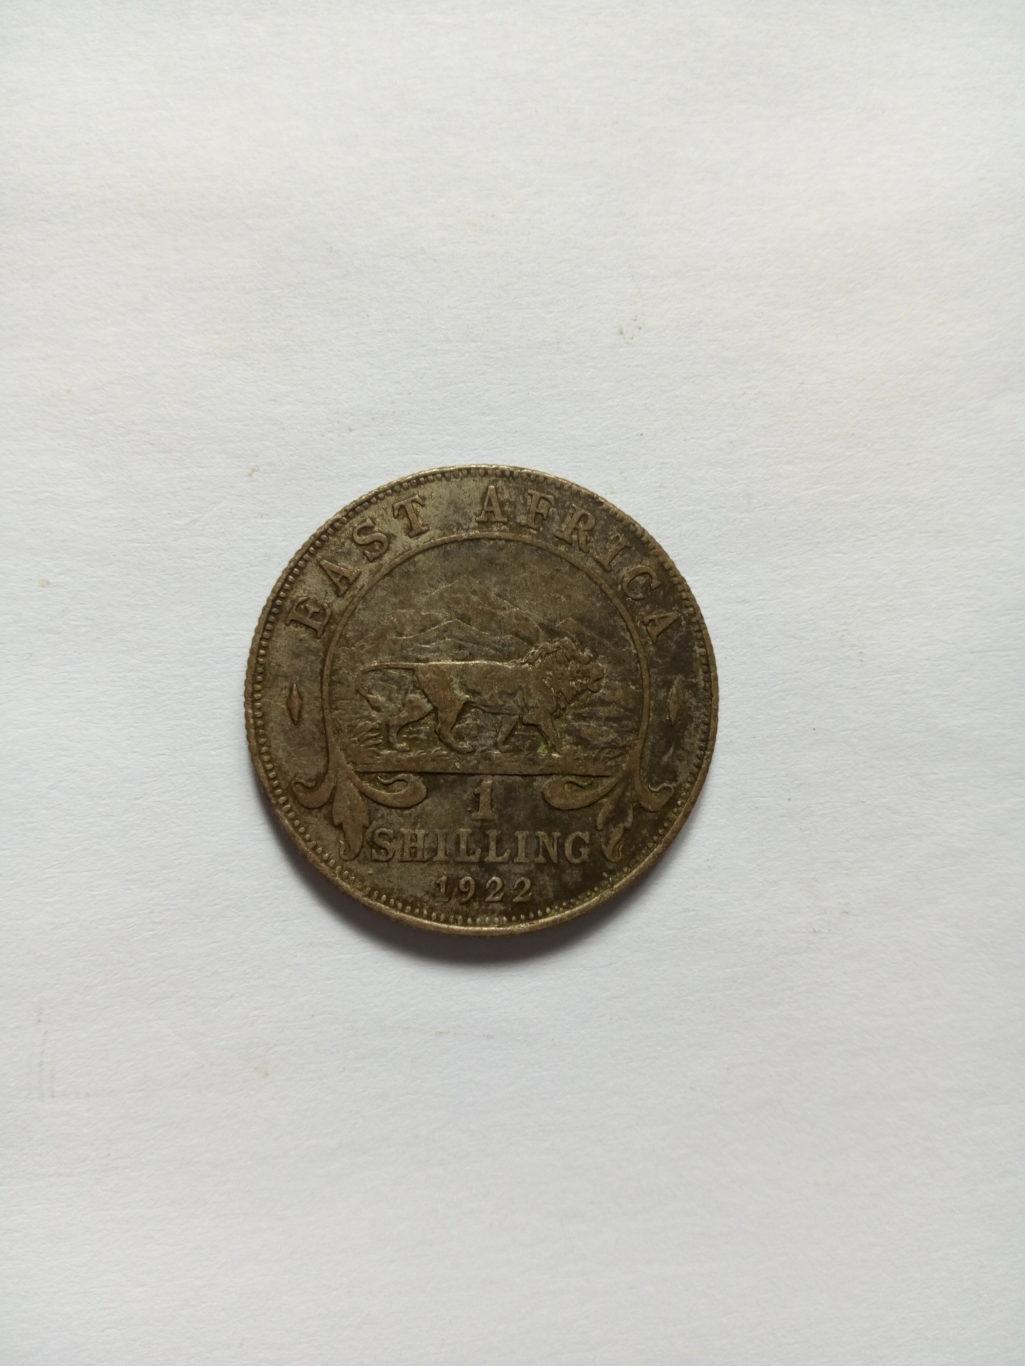 1922_georgivs Rex east Africa 1 shilling